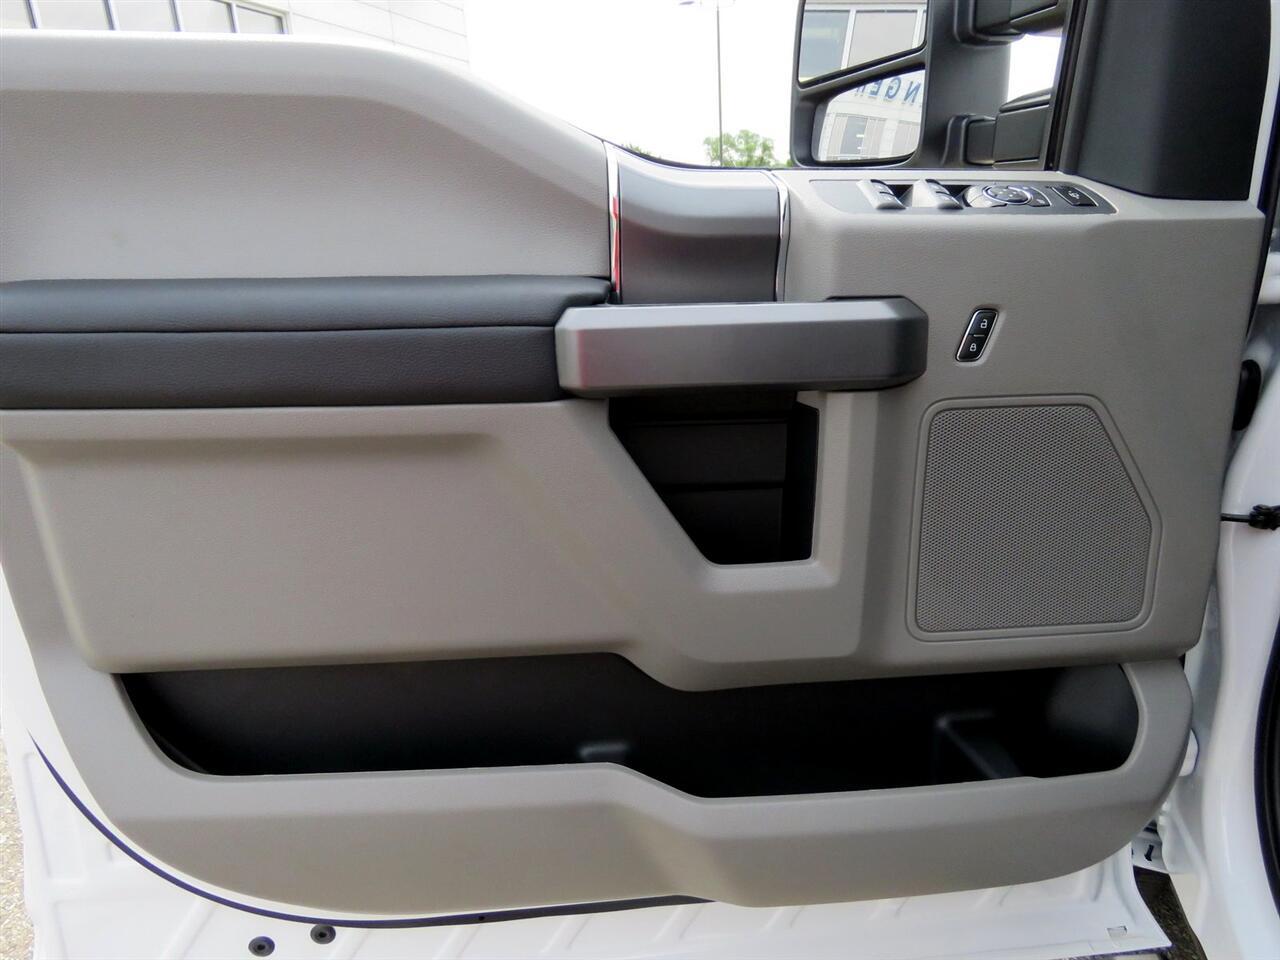 2019 Ford F-250 SD XLT